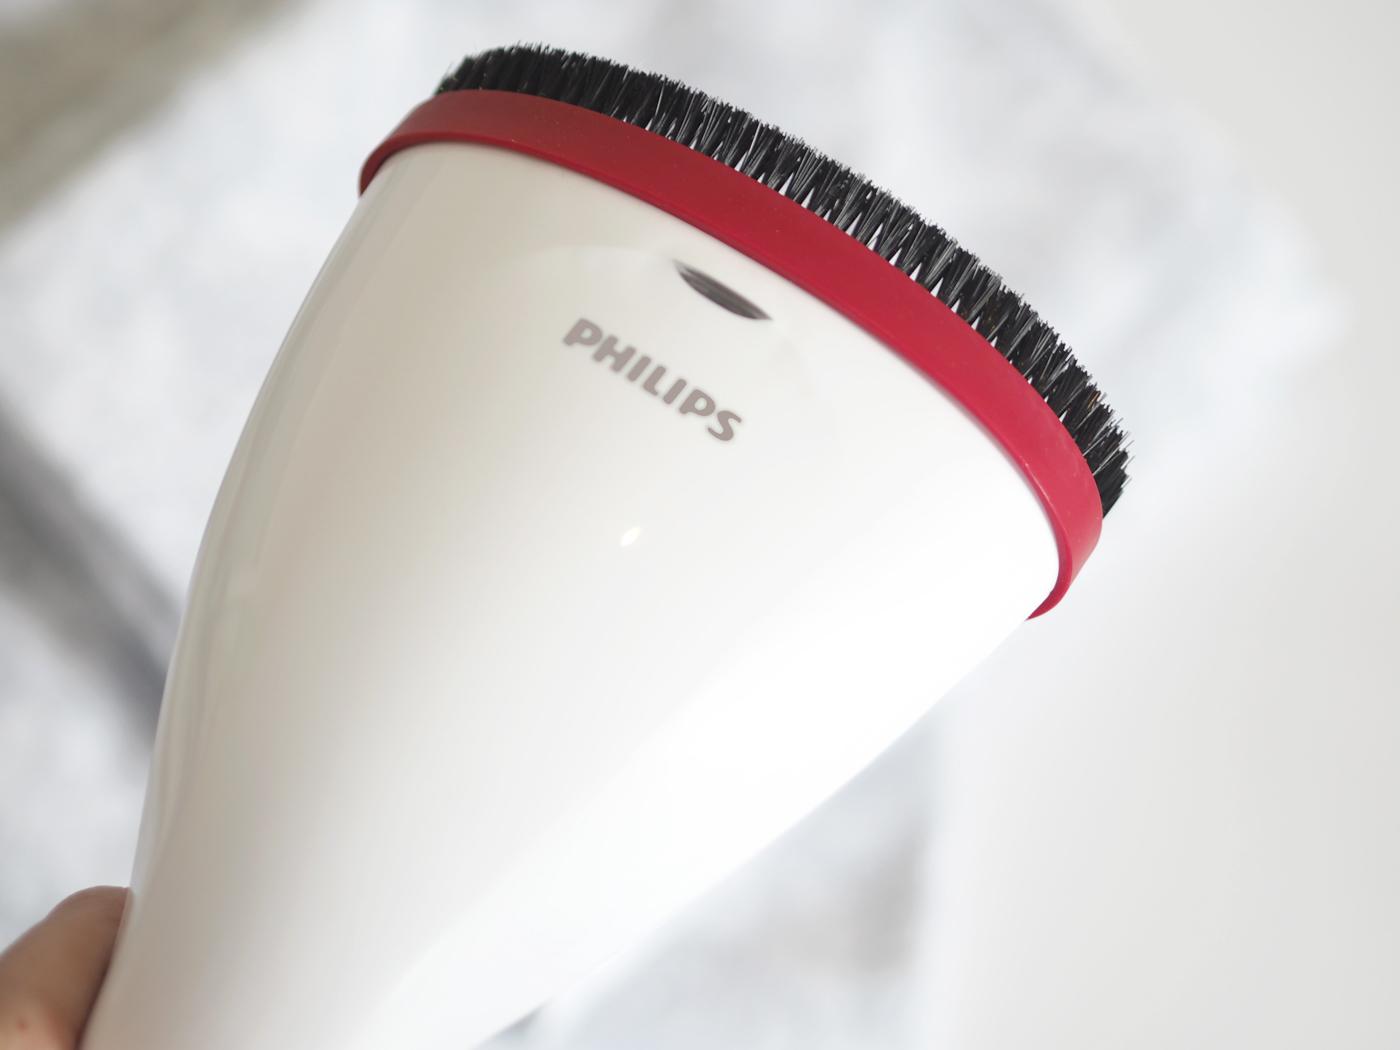 philips-steam-go